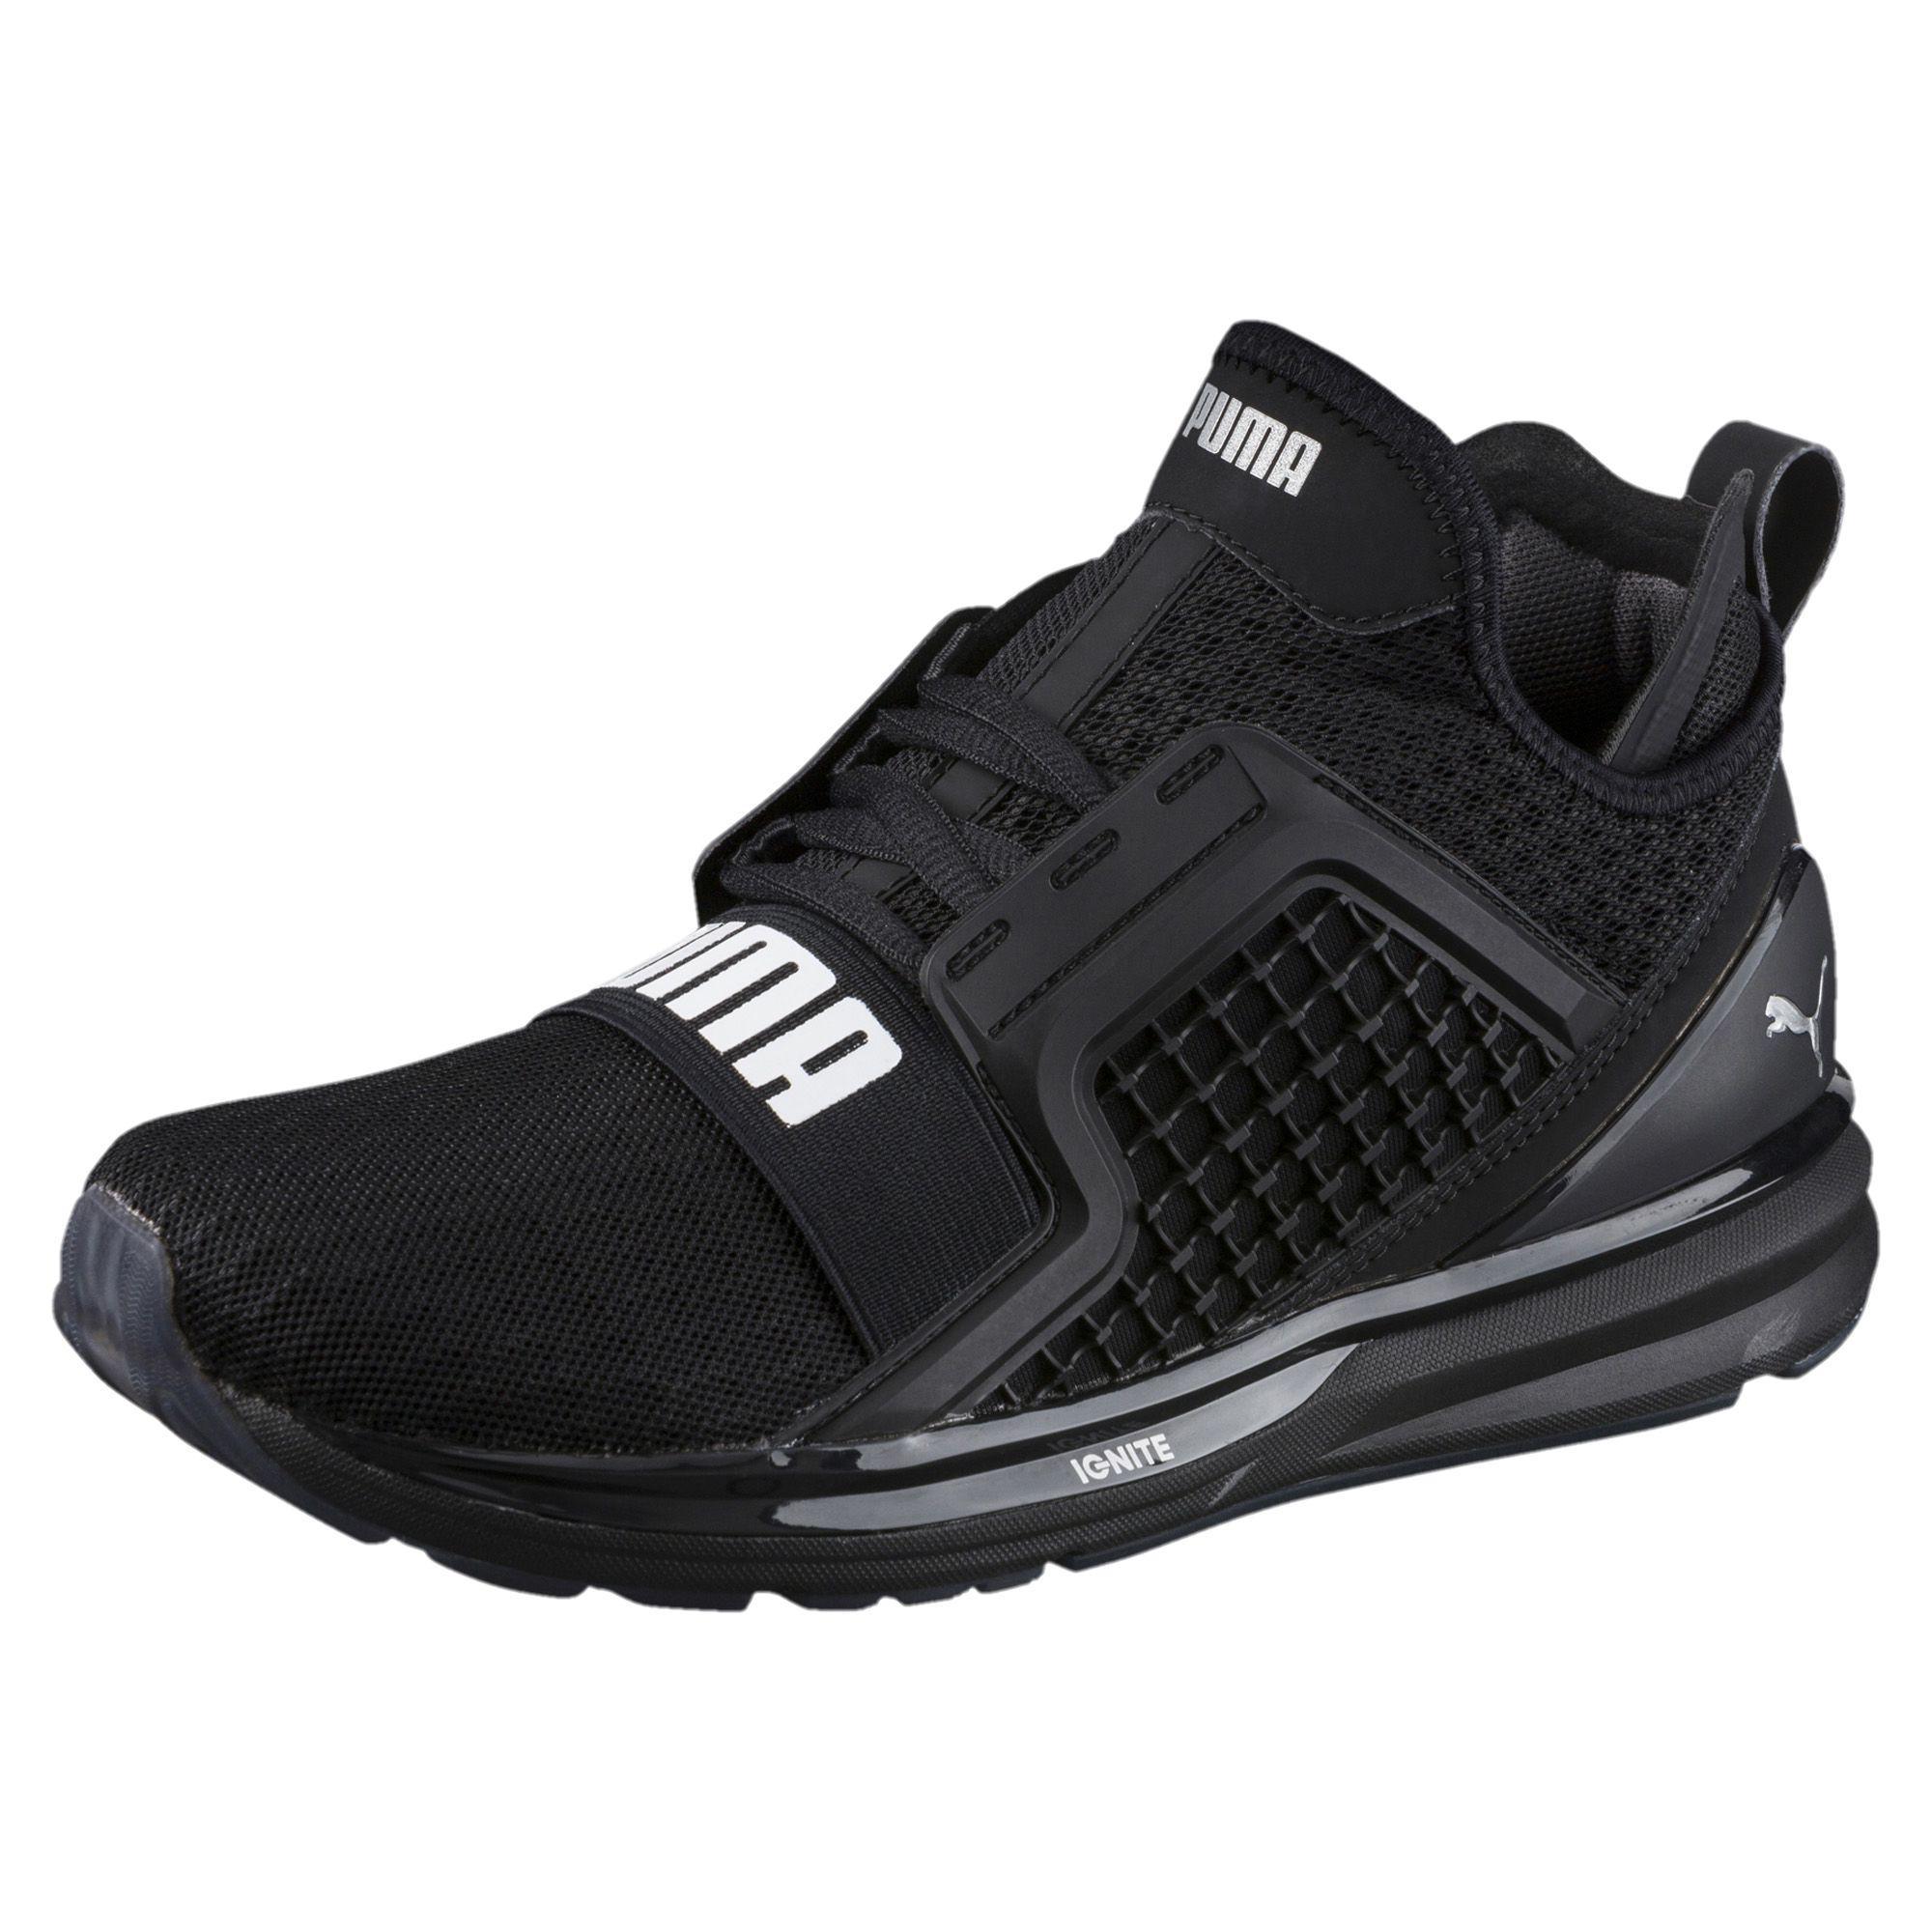 6a42b2e200f Lyst - PUMA Ignite Limitless Women s Training Shoes in Black